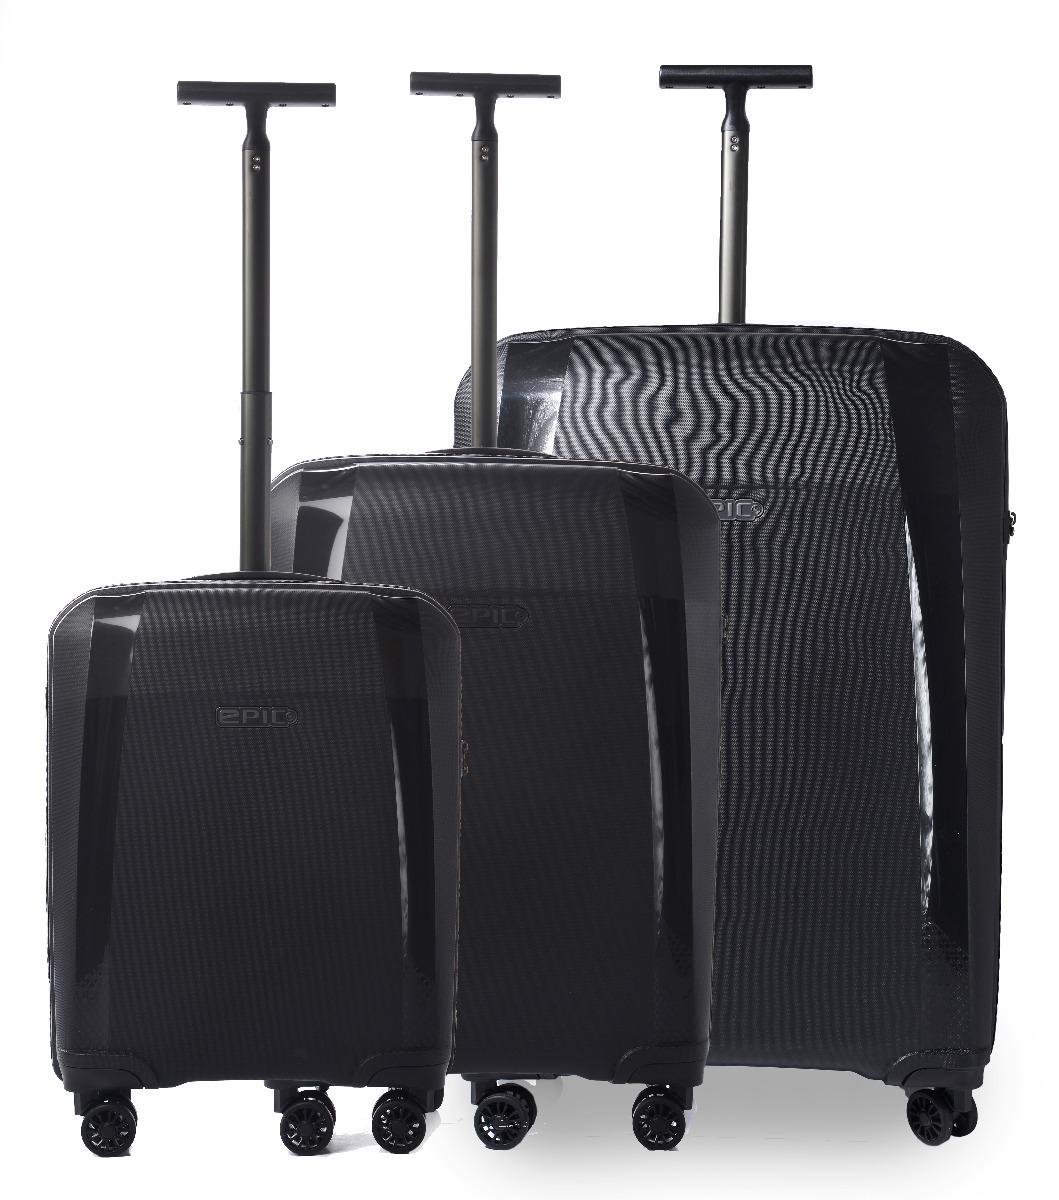 Epic Phantom SL 3 set - 76cm + 66cm + 55cm - 4 hjul-Black